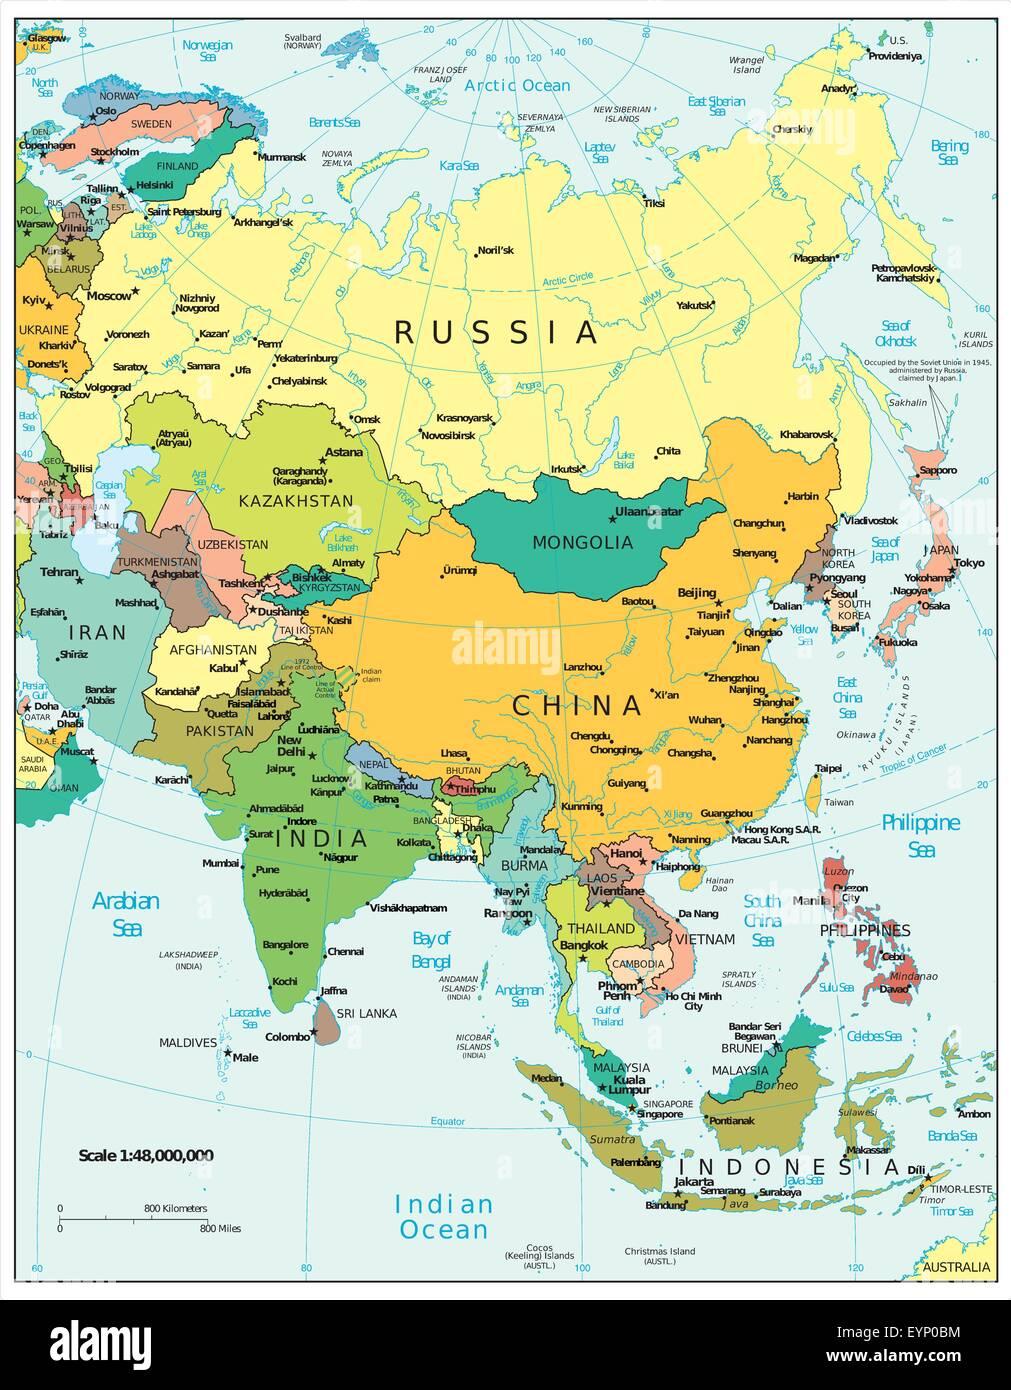 Asia political map Stock Vector Art & Illustration, Vector ...